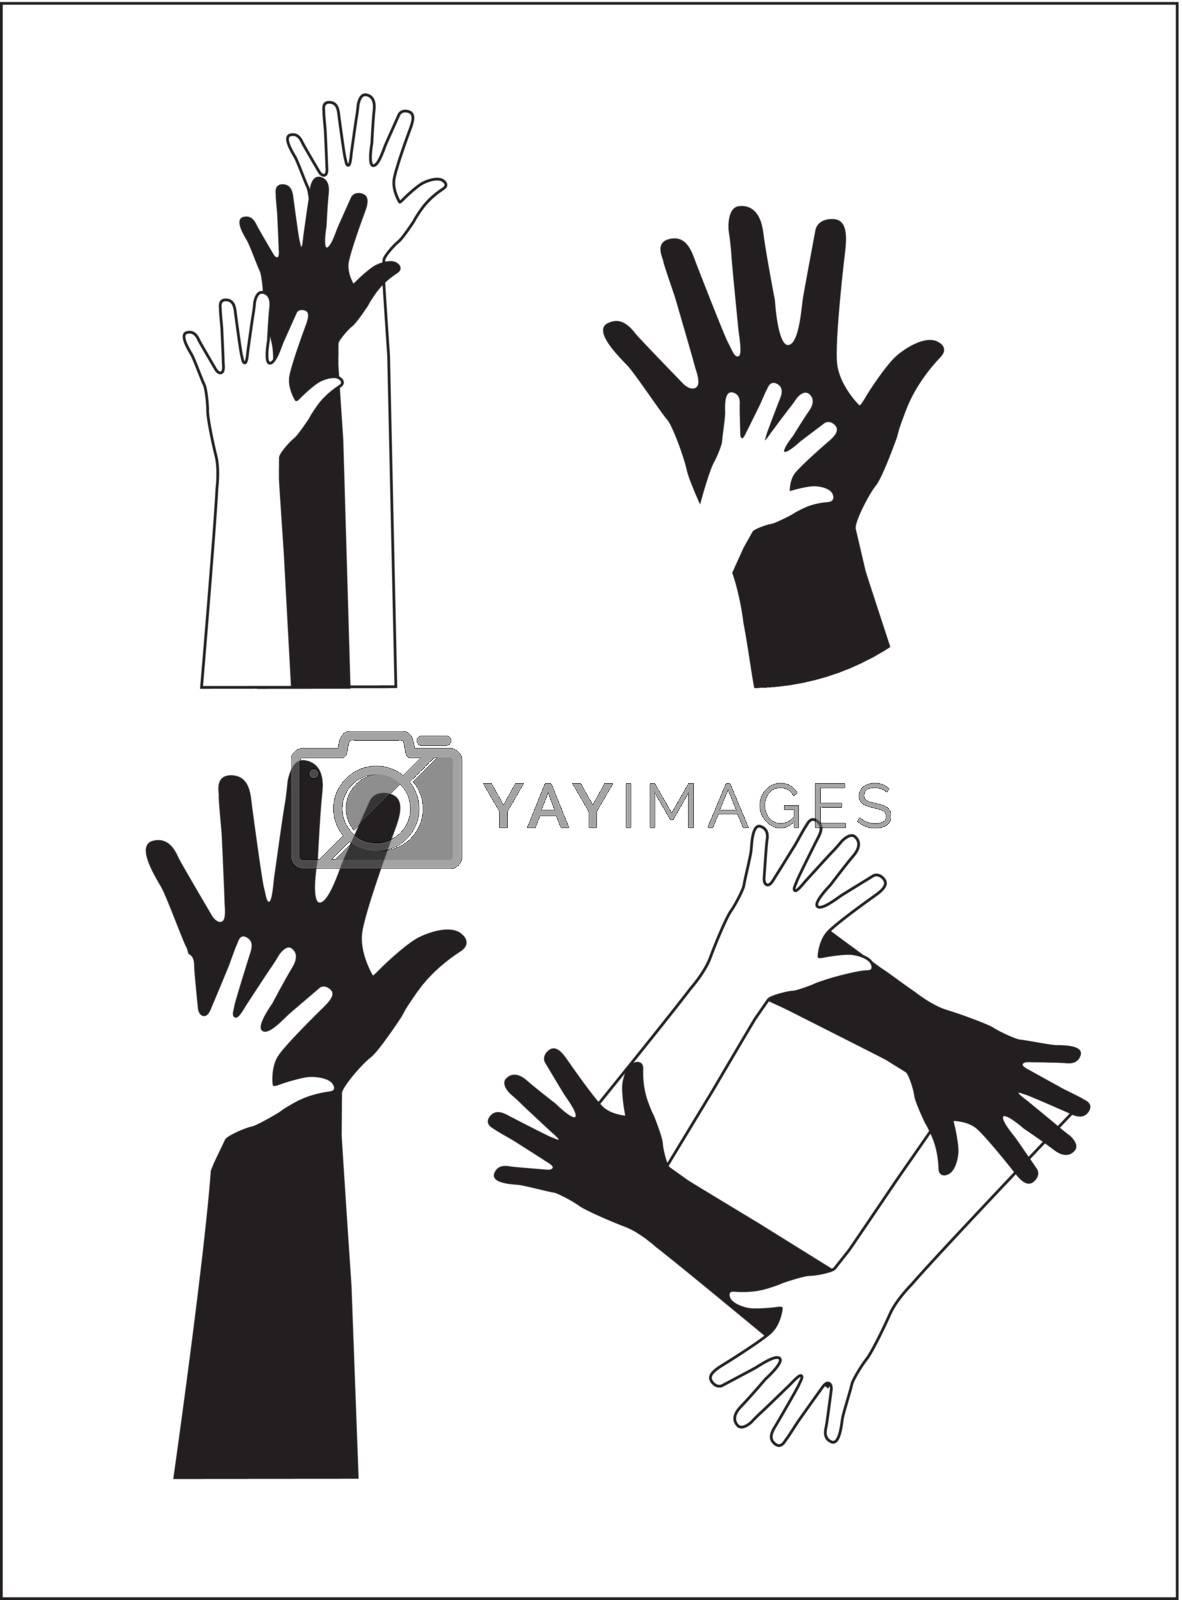 Black and white hands over white background vector illustration